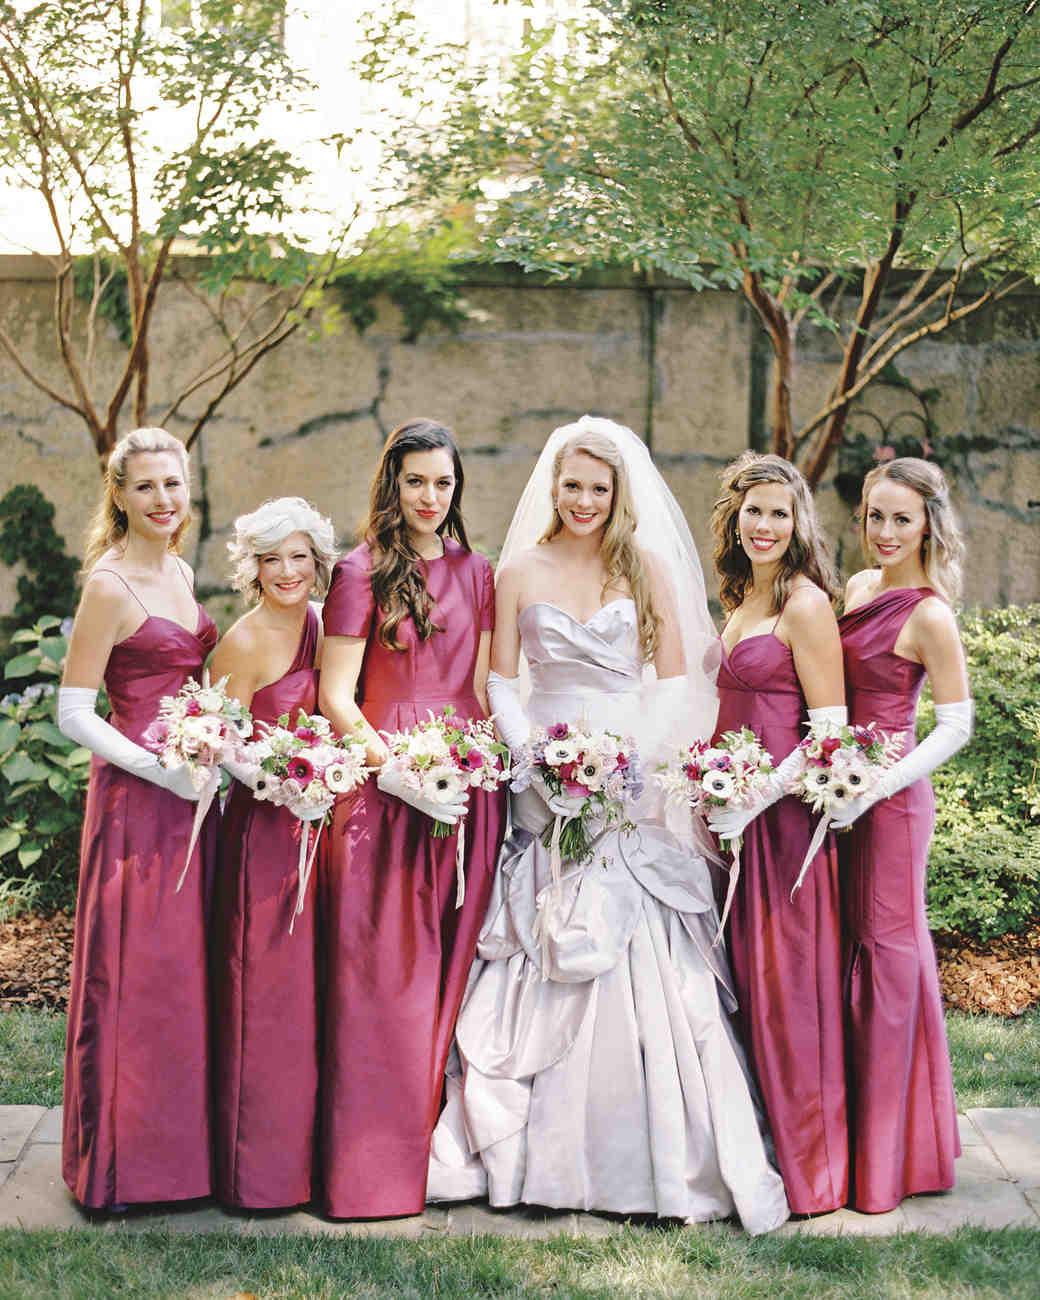 katelyn-austin-wedding-virgina-ka0397-s111979.jpg